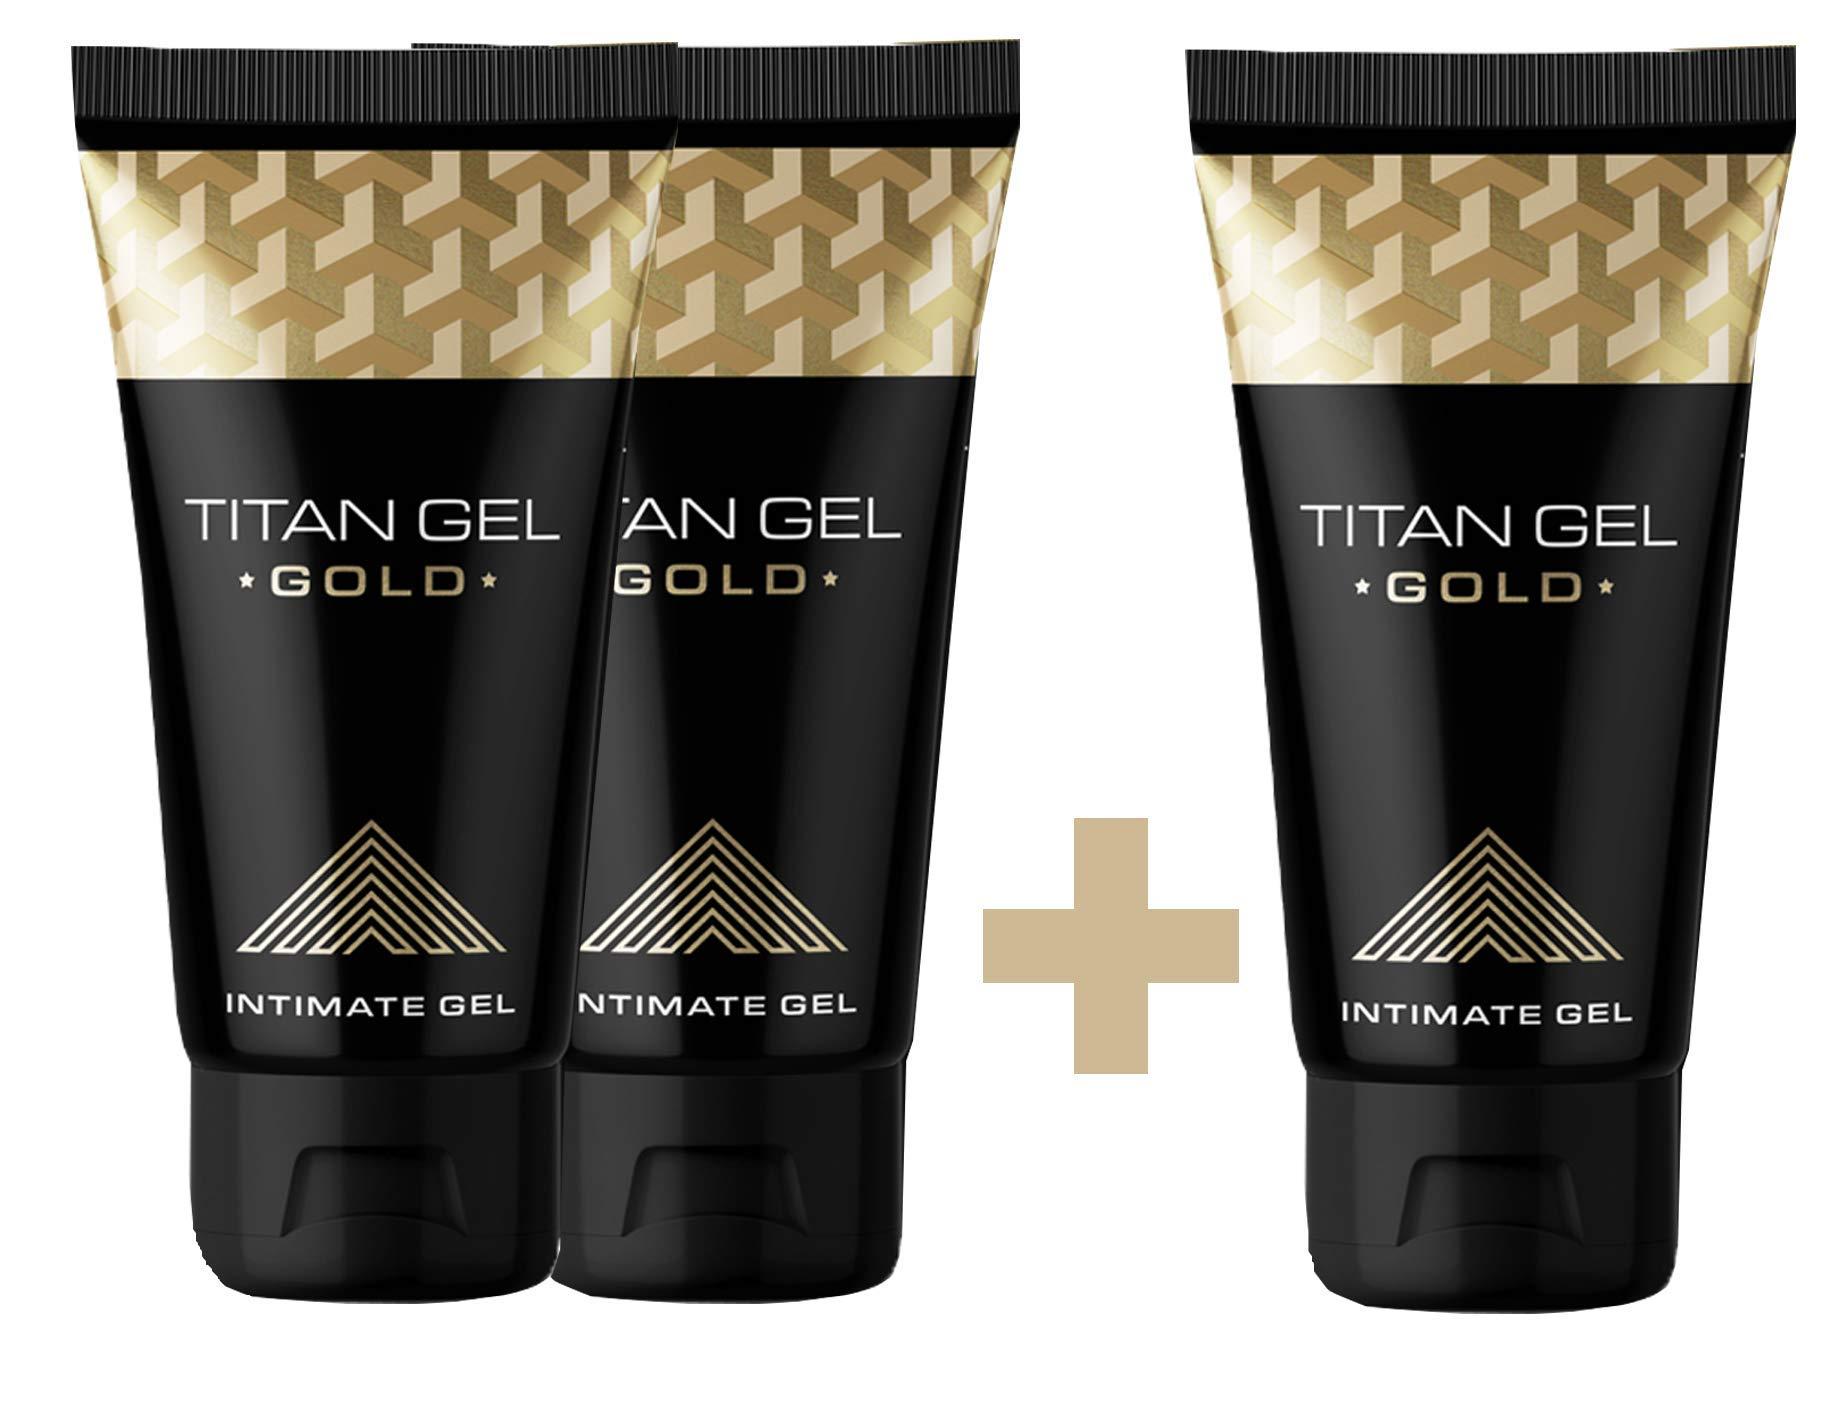 Titan Gel – Intimate Gel for Men – Increasing Gel – Gold Version - 2+1 - by Hendel's Garden